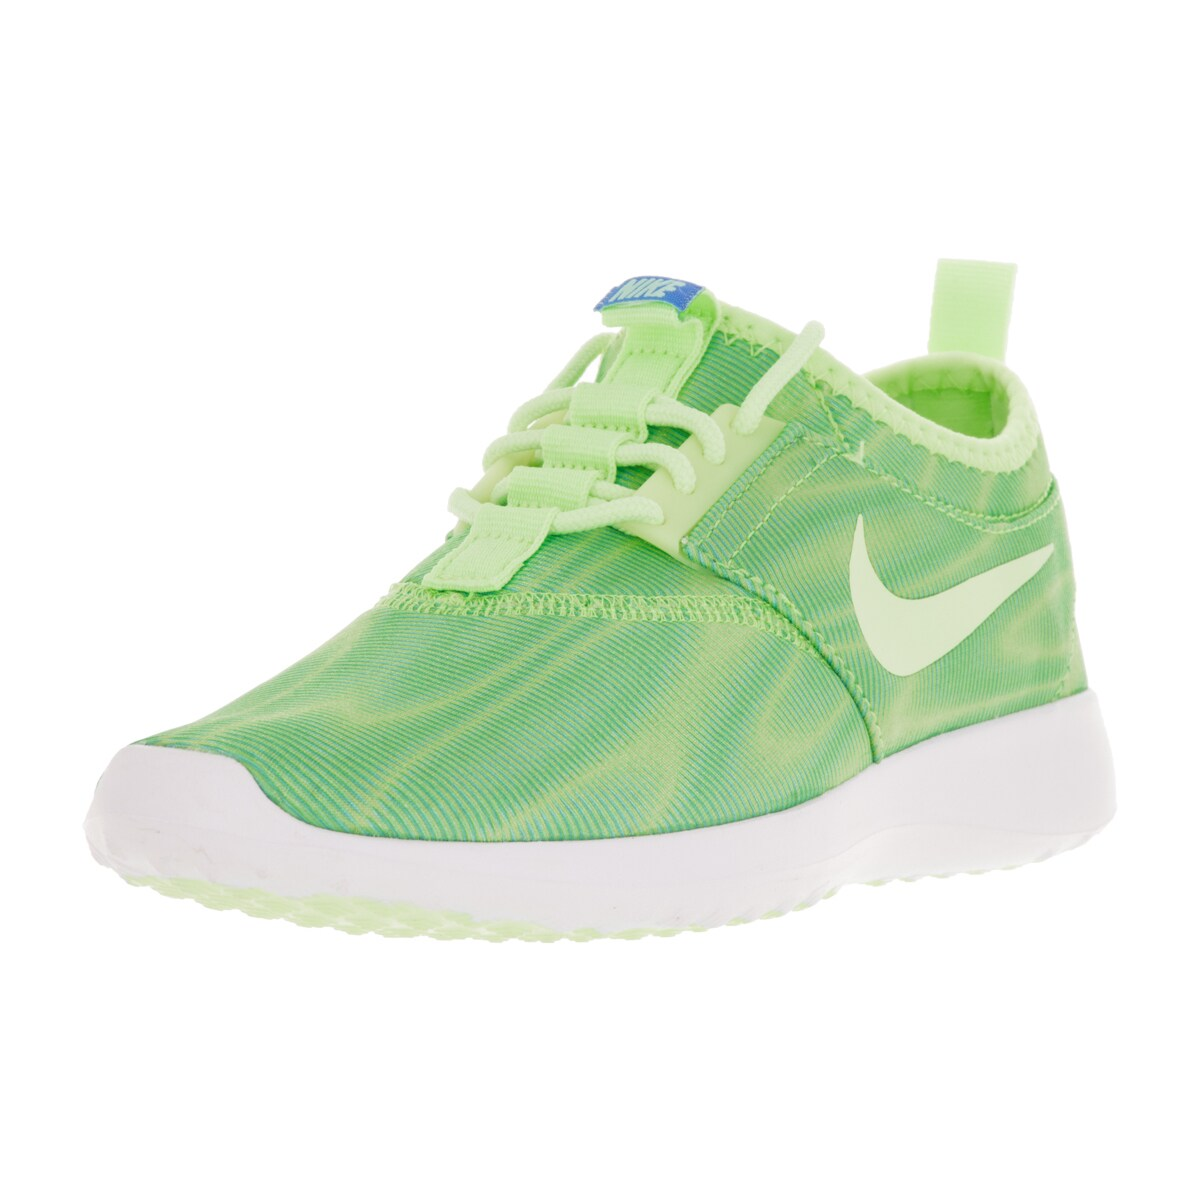 Nike Women's Juvenate Print Green Plastic Casual Shoe (7)...